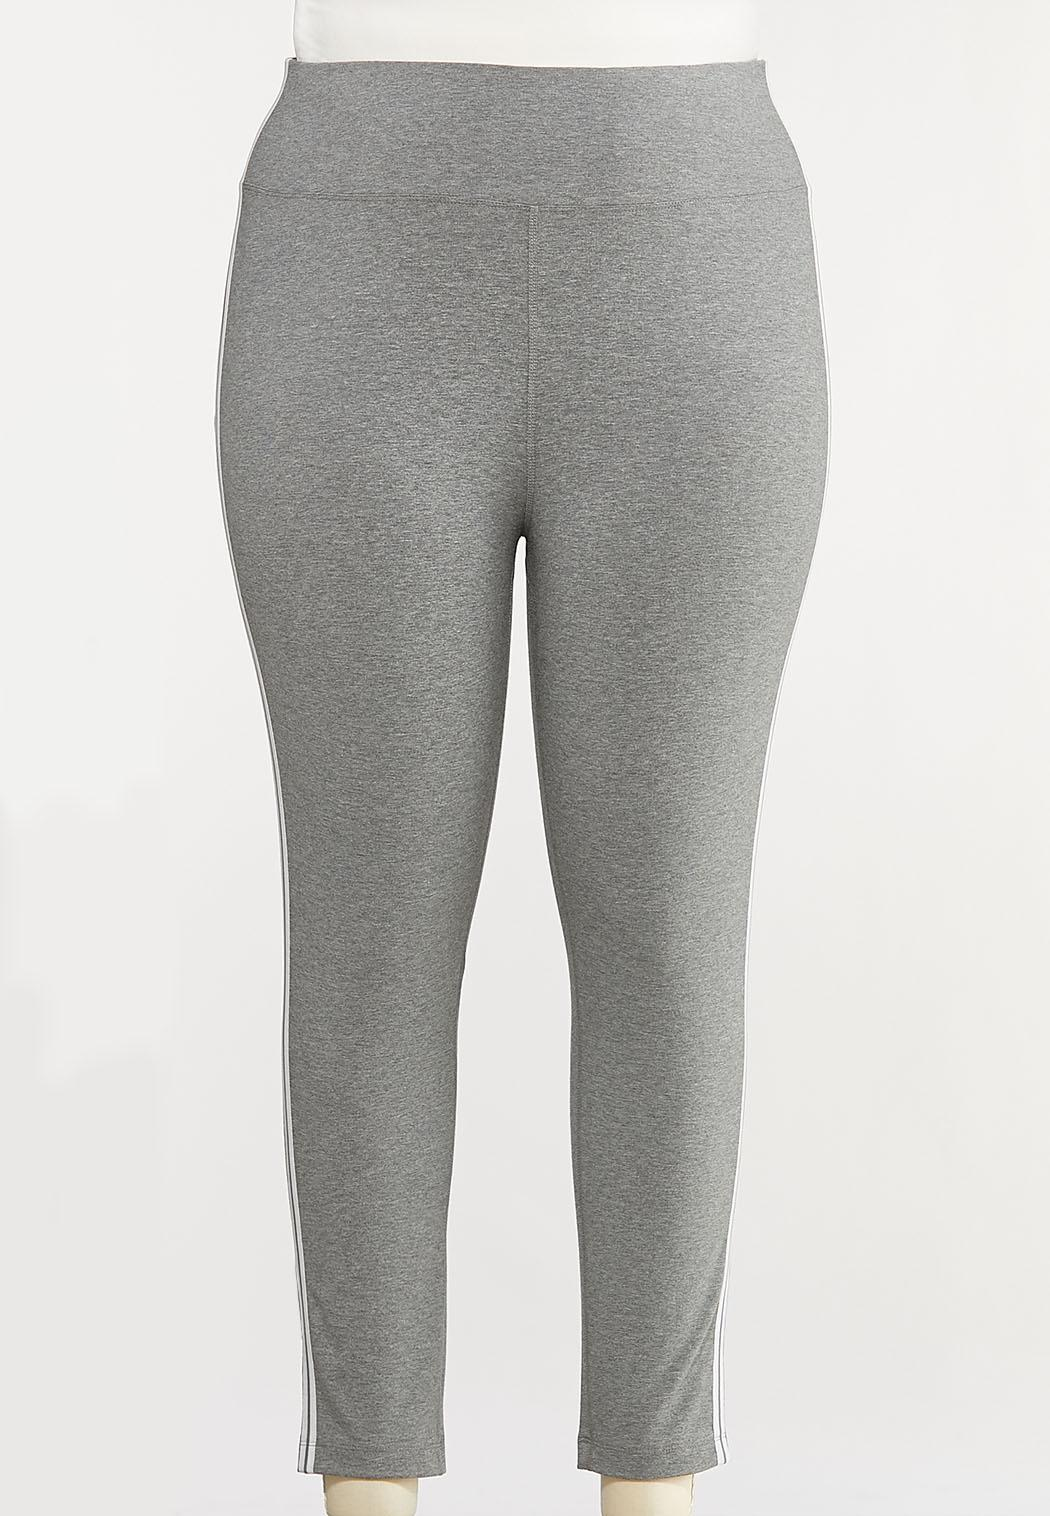 Plus Size White Striped Leggings